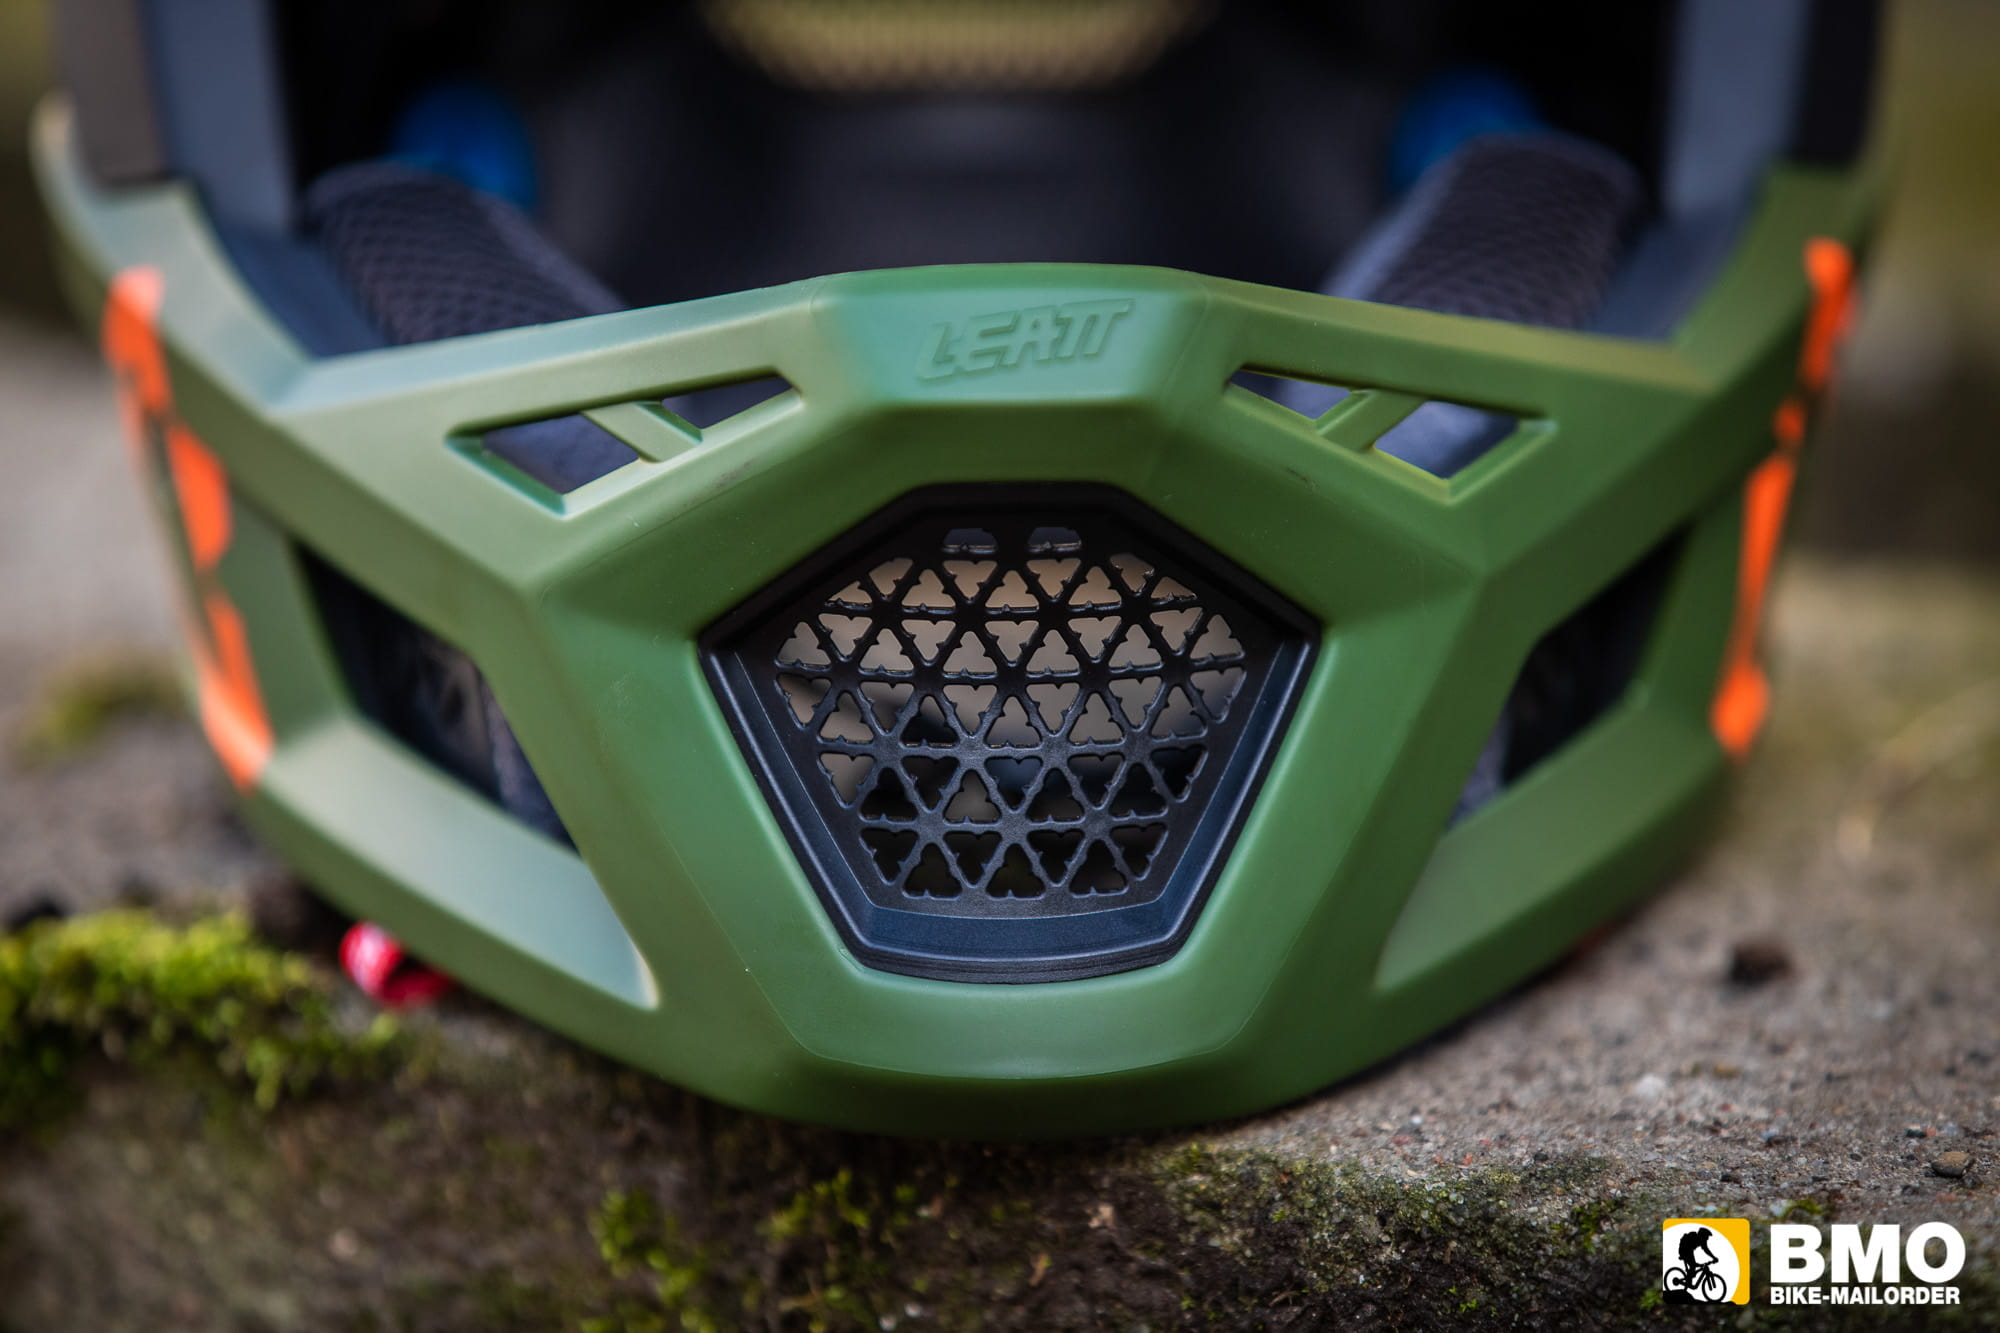 Leatt-DBX-4-0-Super-Ventilated-Fullface-Helm-Bike-Mailorder-7